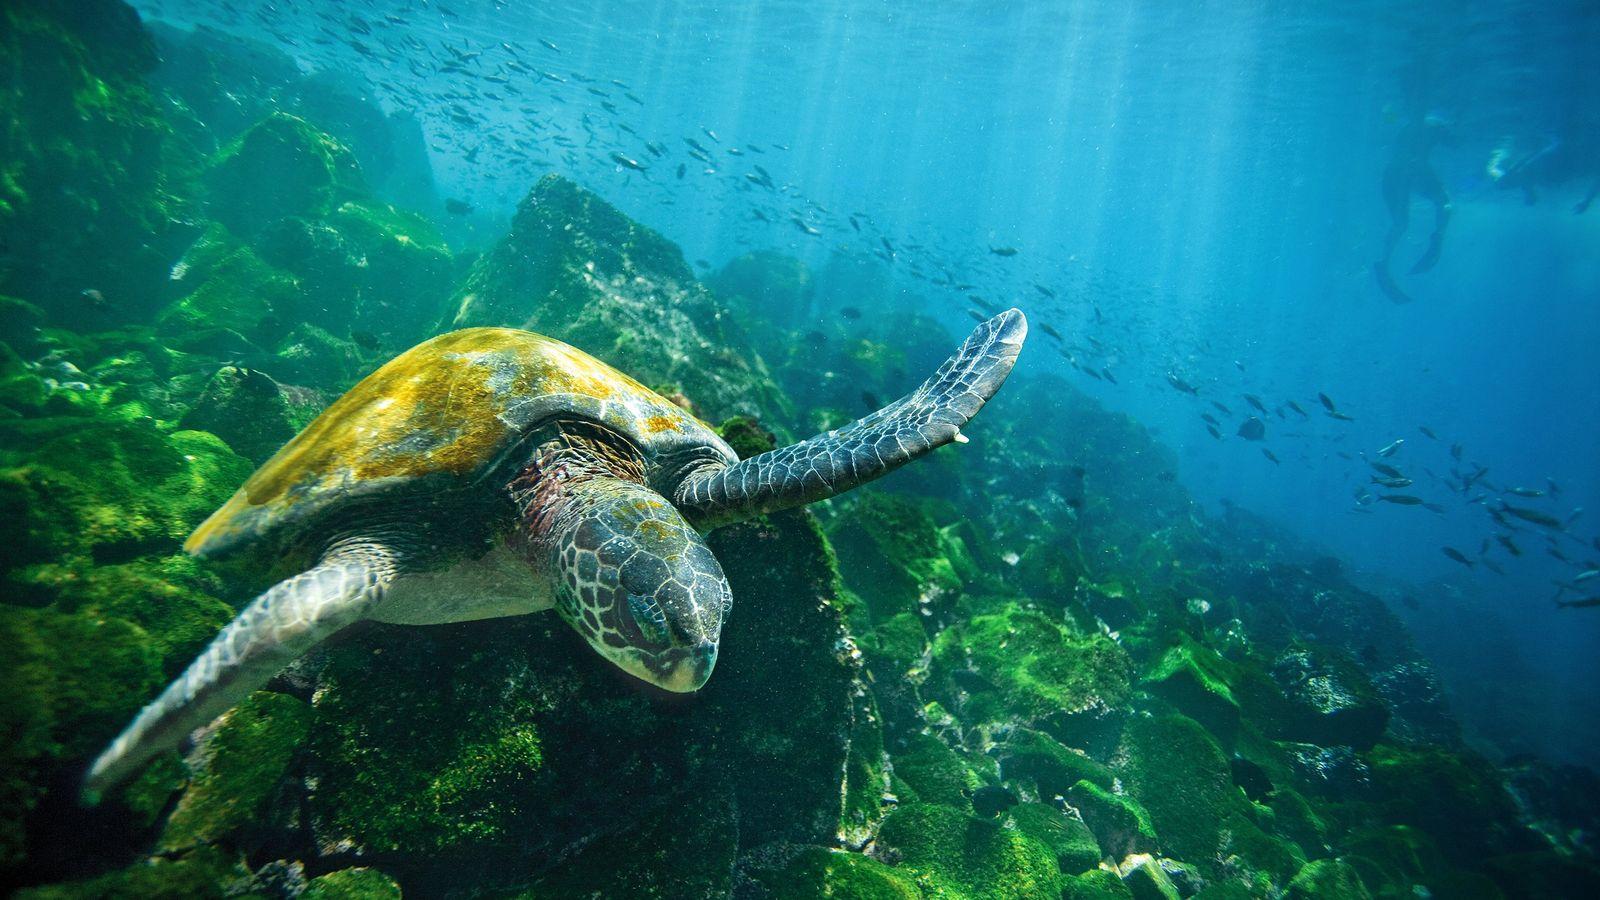 green-sea-turtle-isabela-island-galapagos